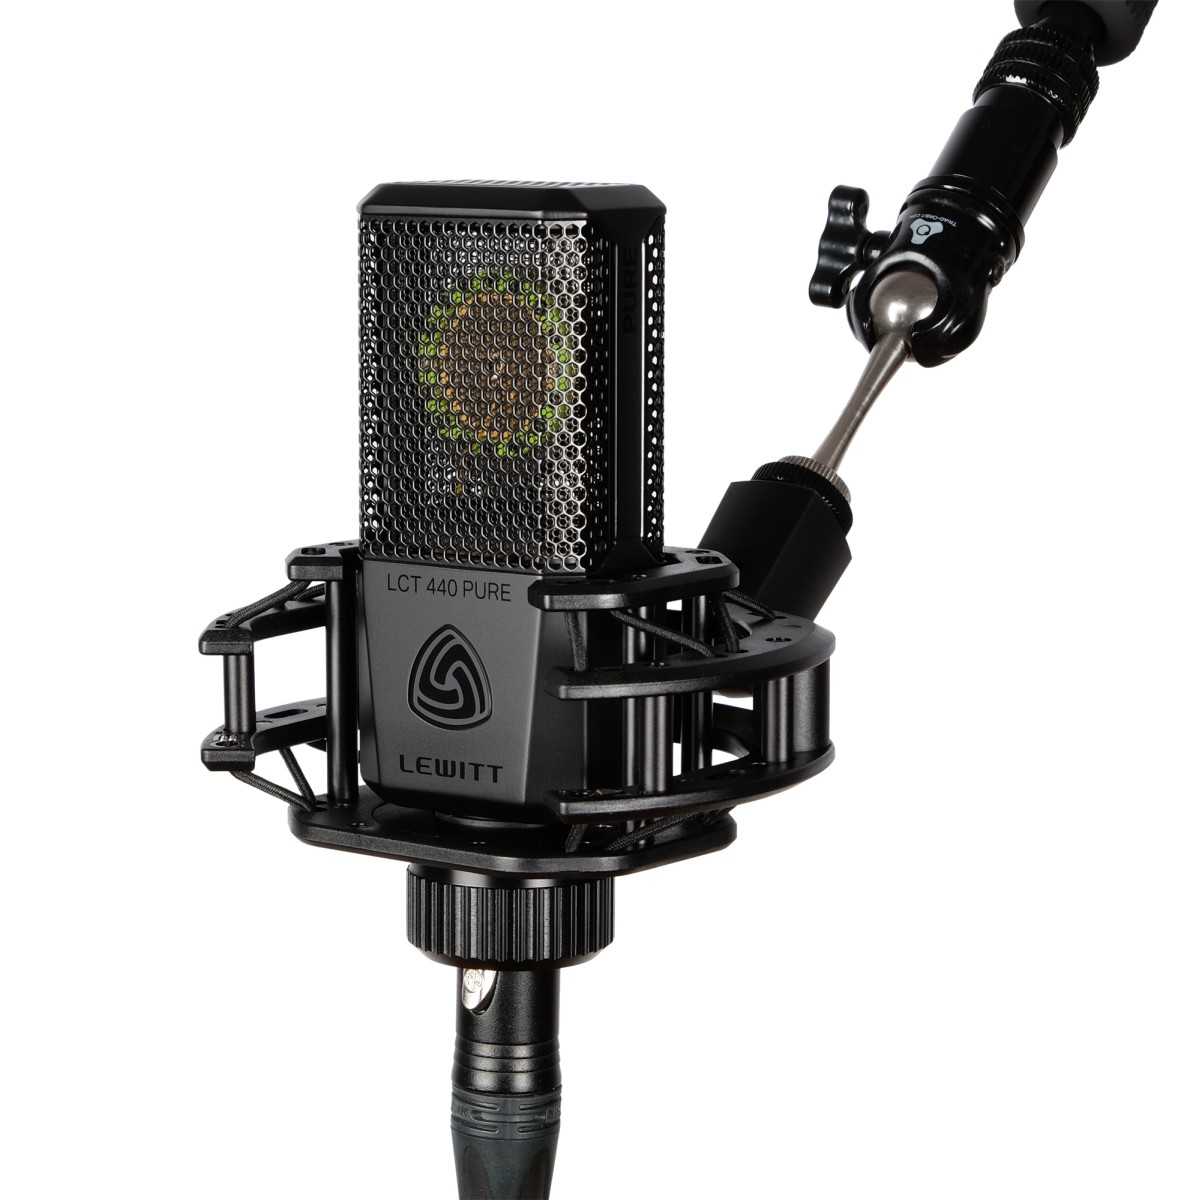 Lewitt LCT 440 PURE Kondensatormikrofon PROMO